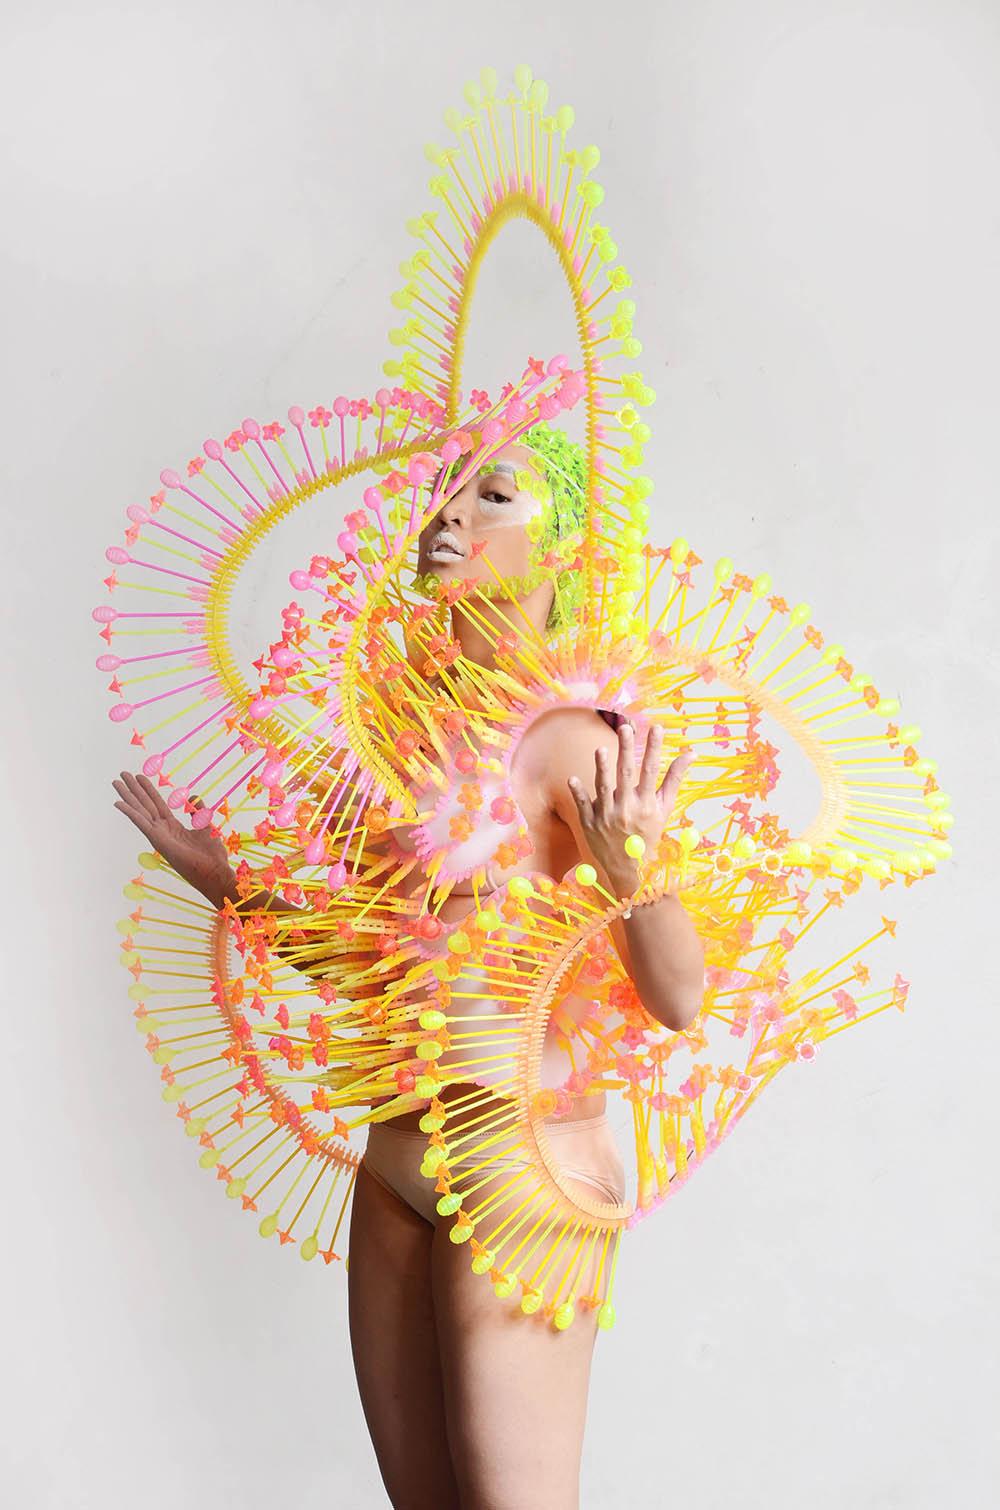 The Cross-Dimensional Wearable Art of Leeroy New